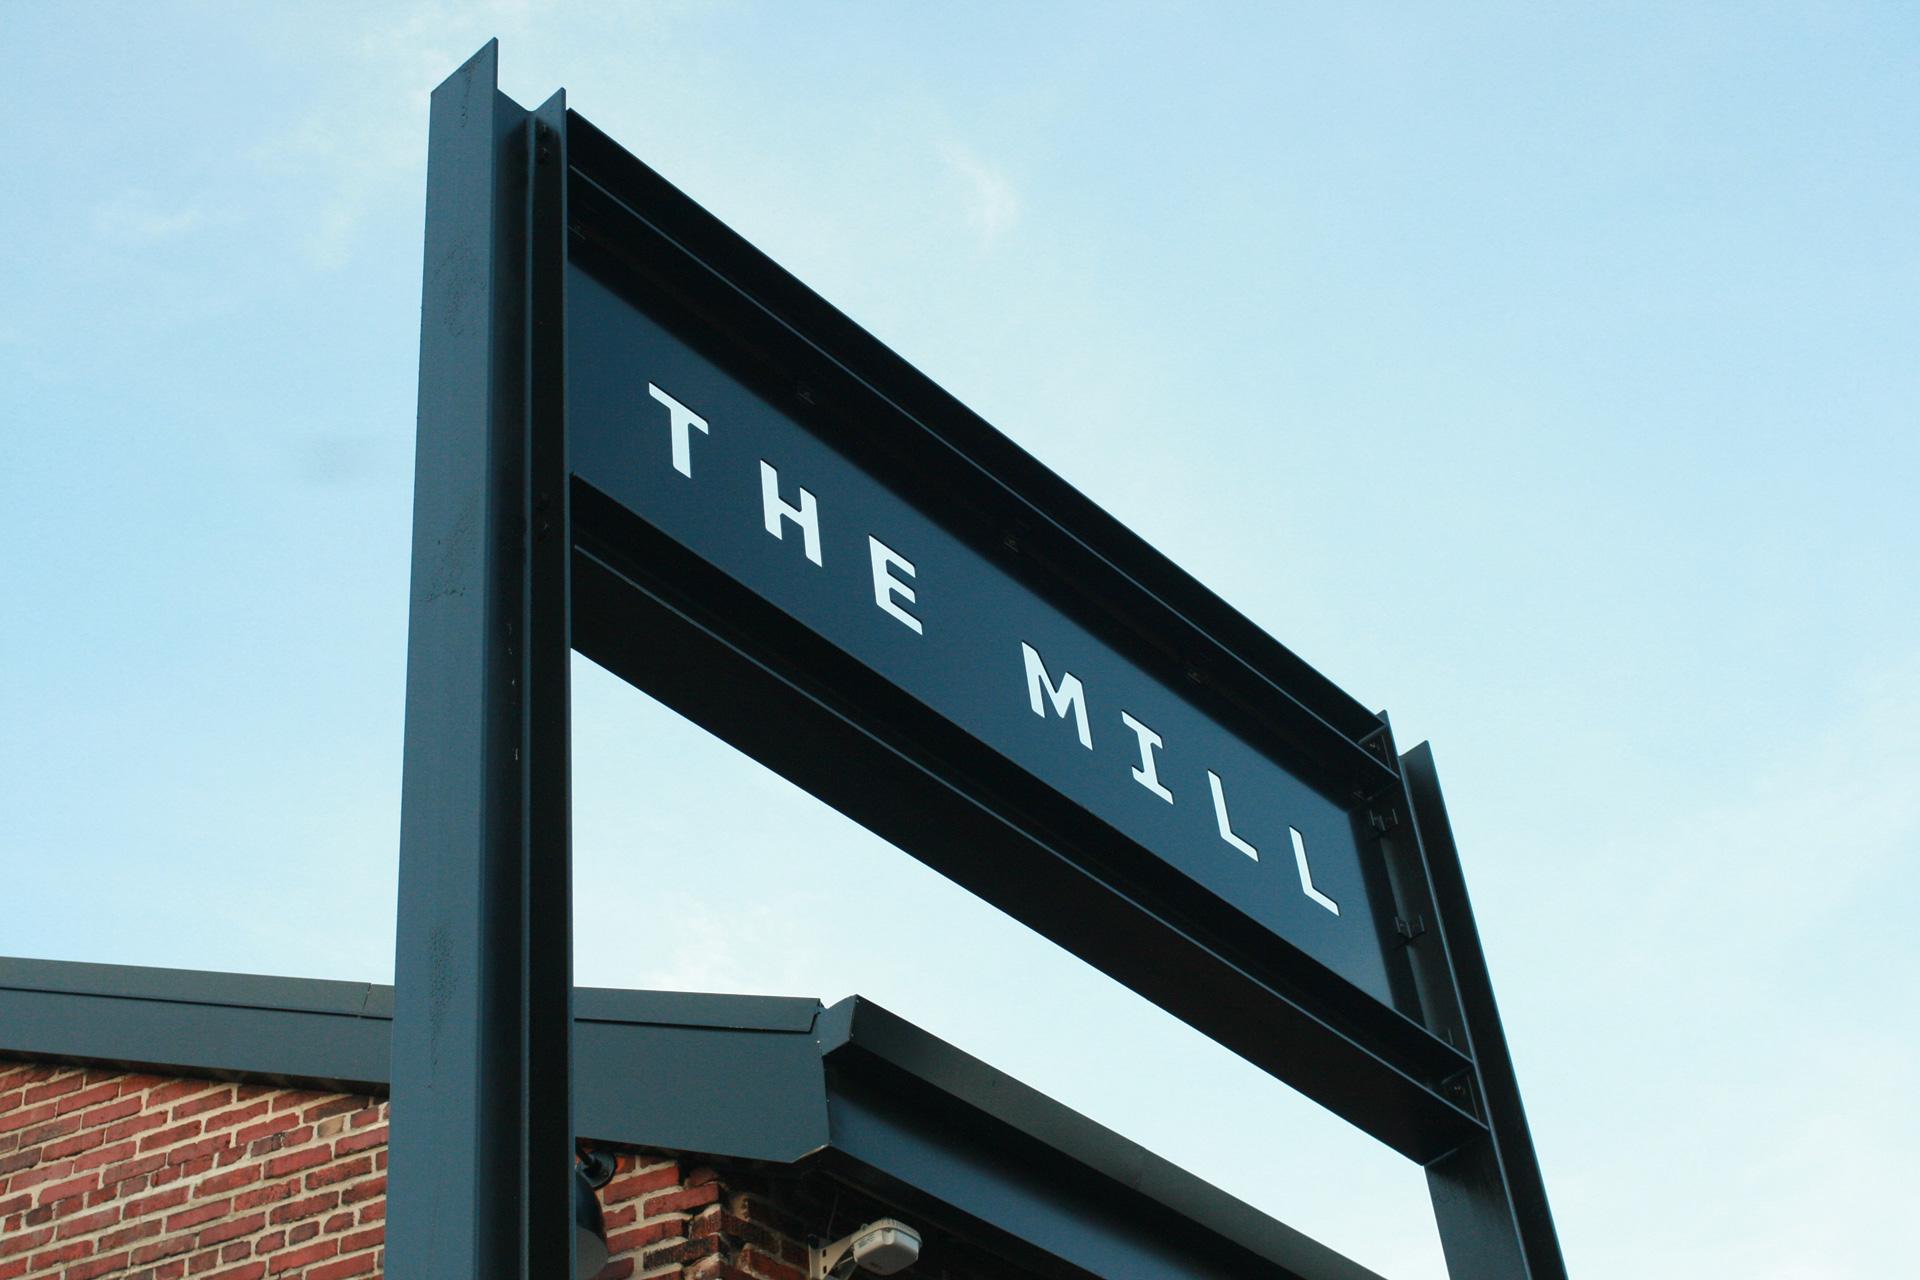 The Mill Identity